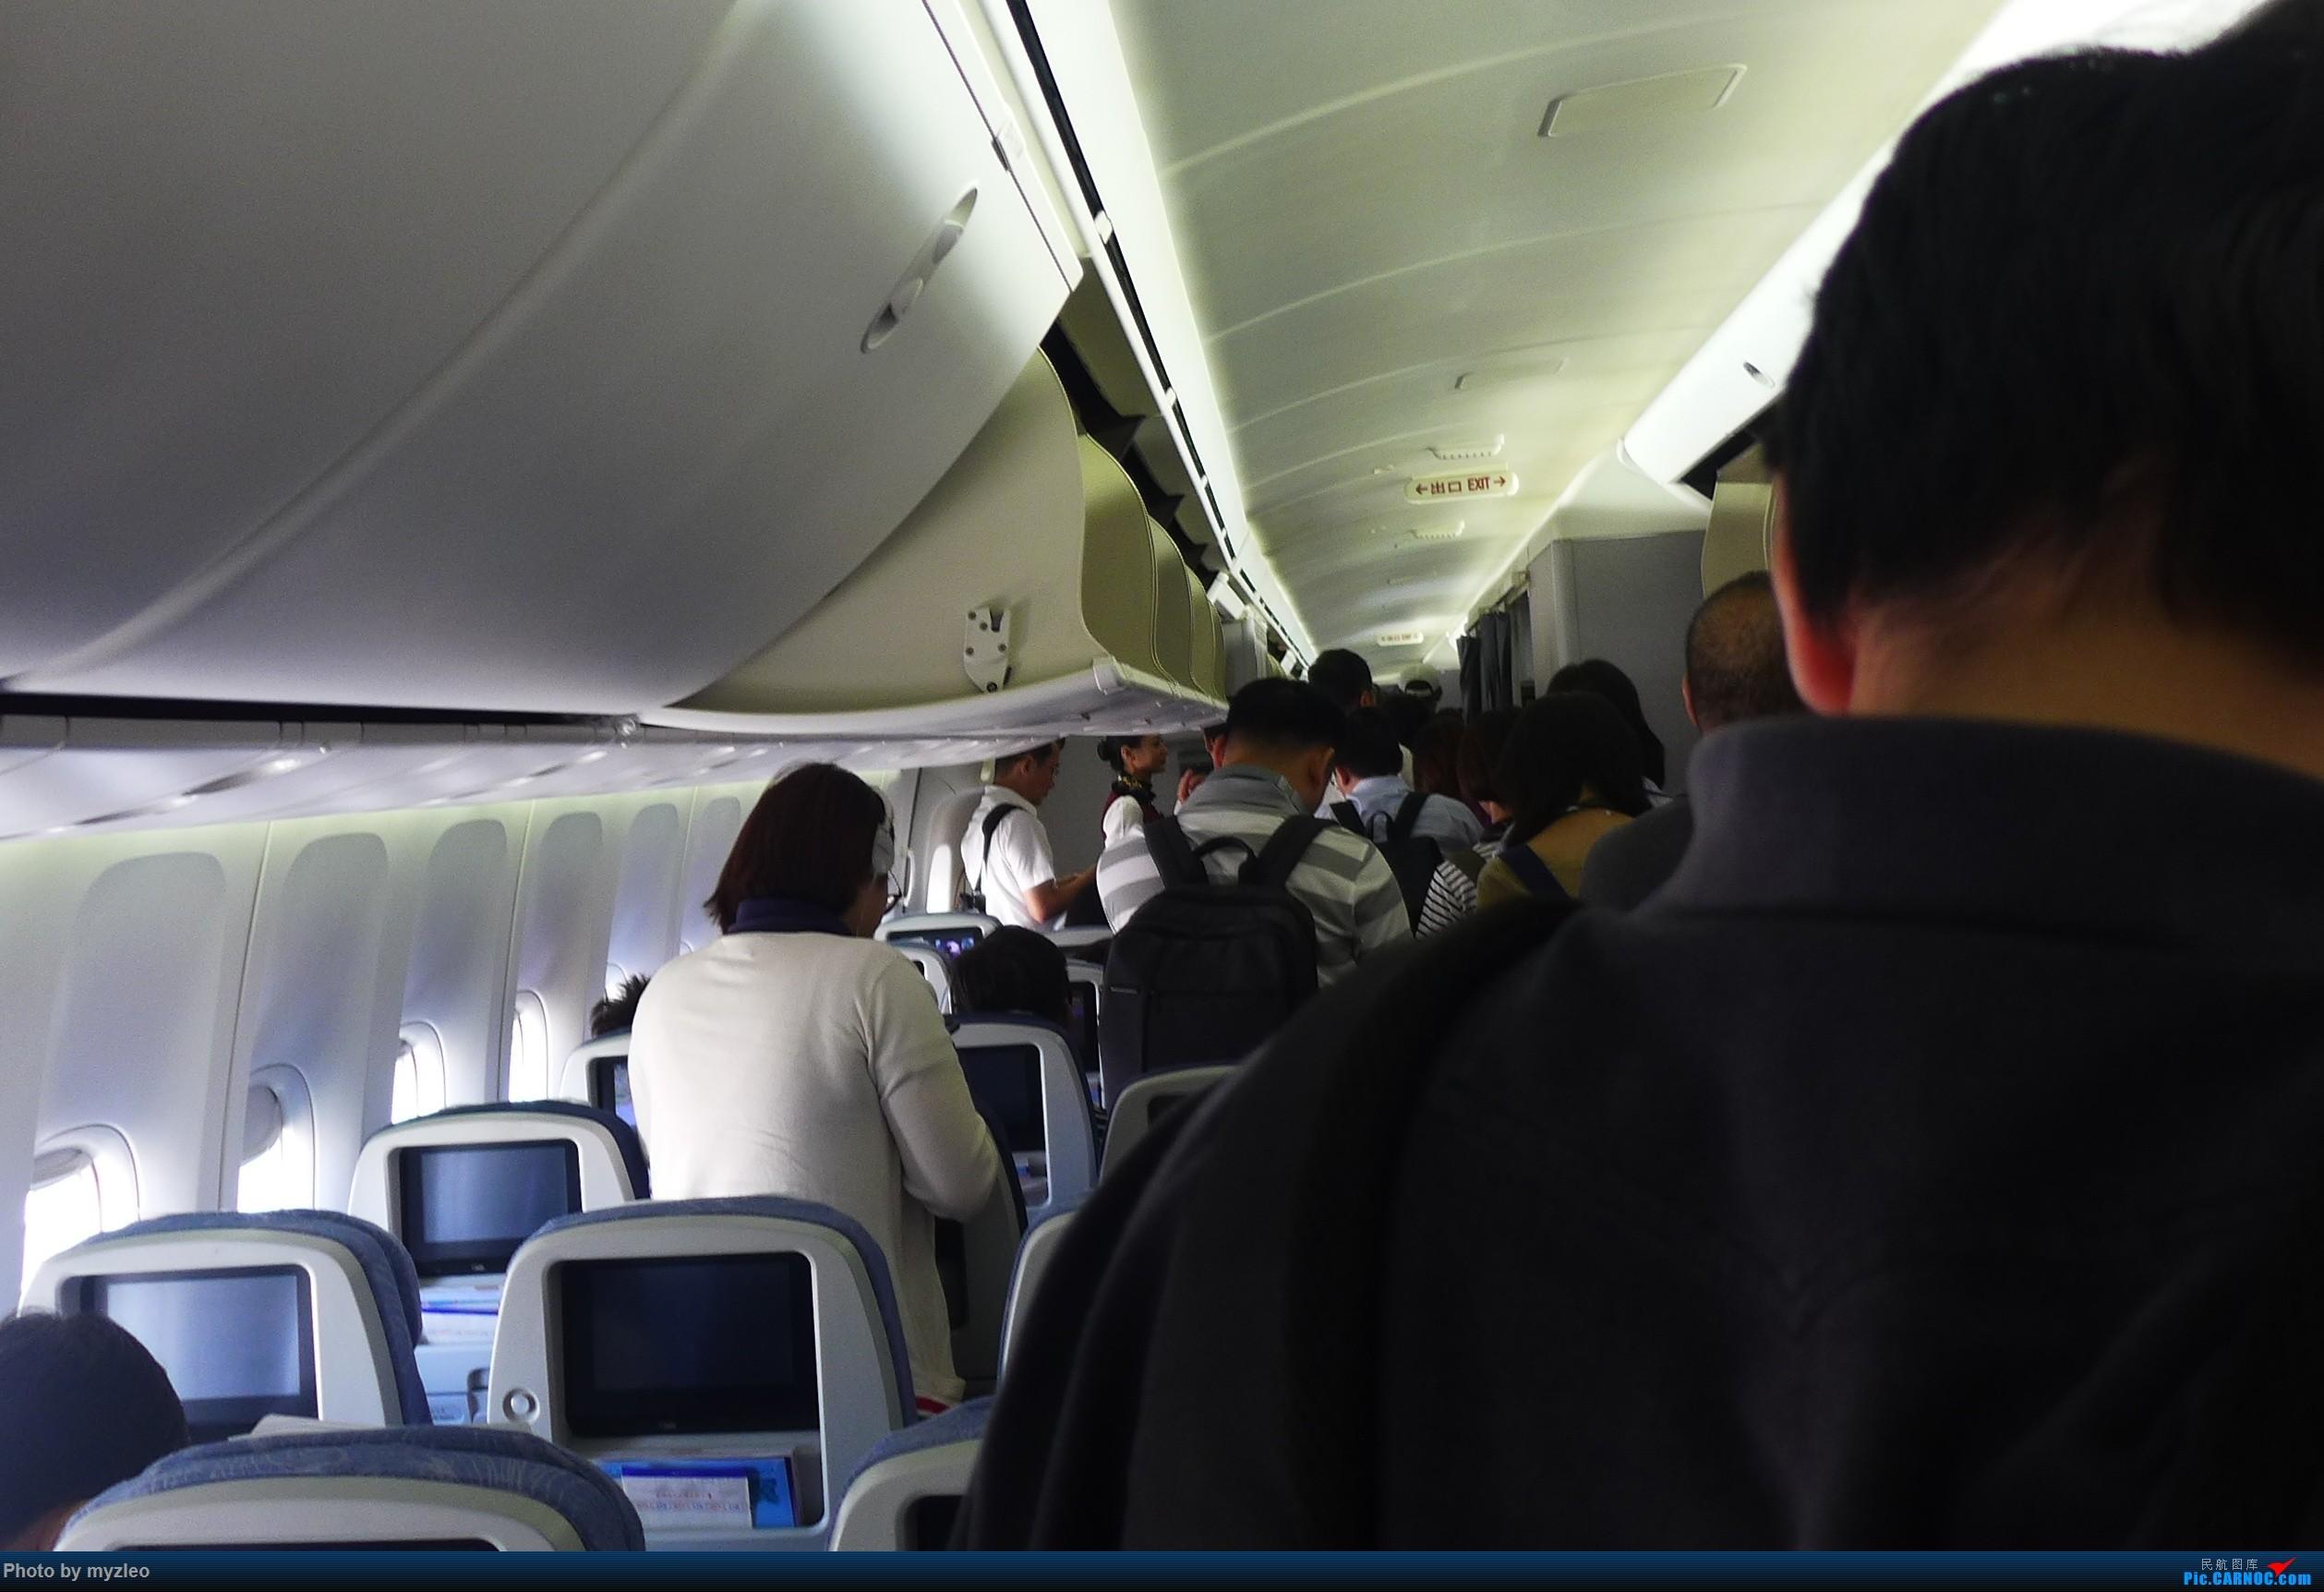 Re:[原创]【myzleo的游记3.1】三访帝都——记一次意外的惊喜,大鹅头初遇,第一次去中关村 BOEING 747-8I B-2486 中国北京首都国际机场